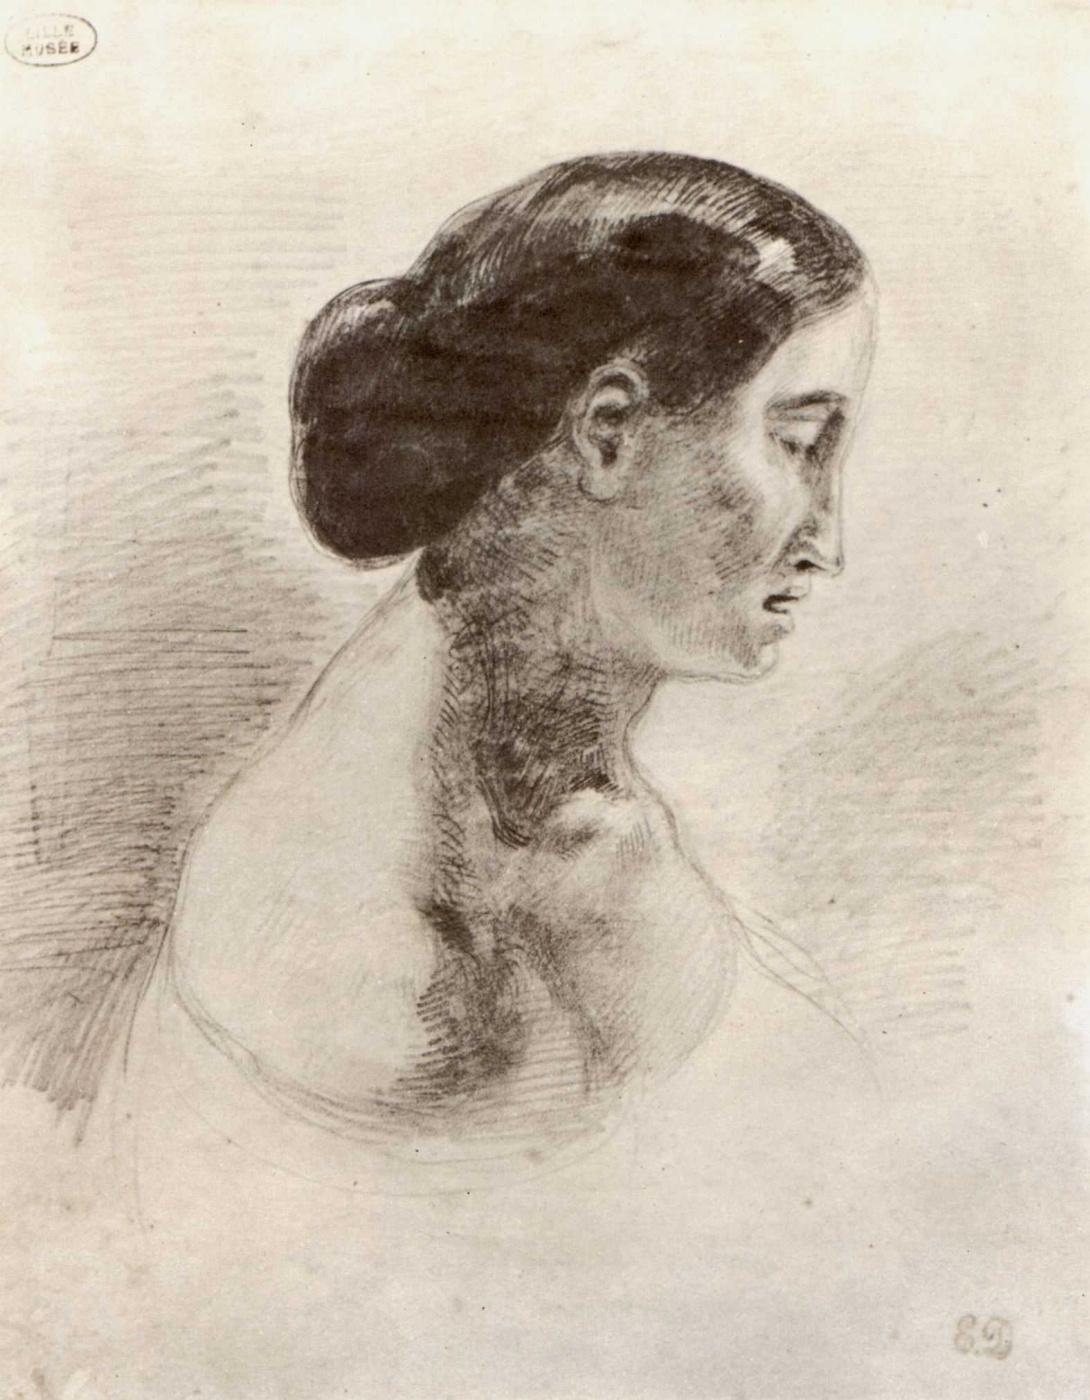 Eugene Delacroix. Portrait of a lady in profile